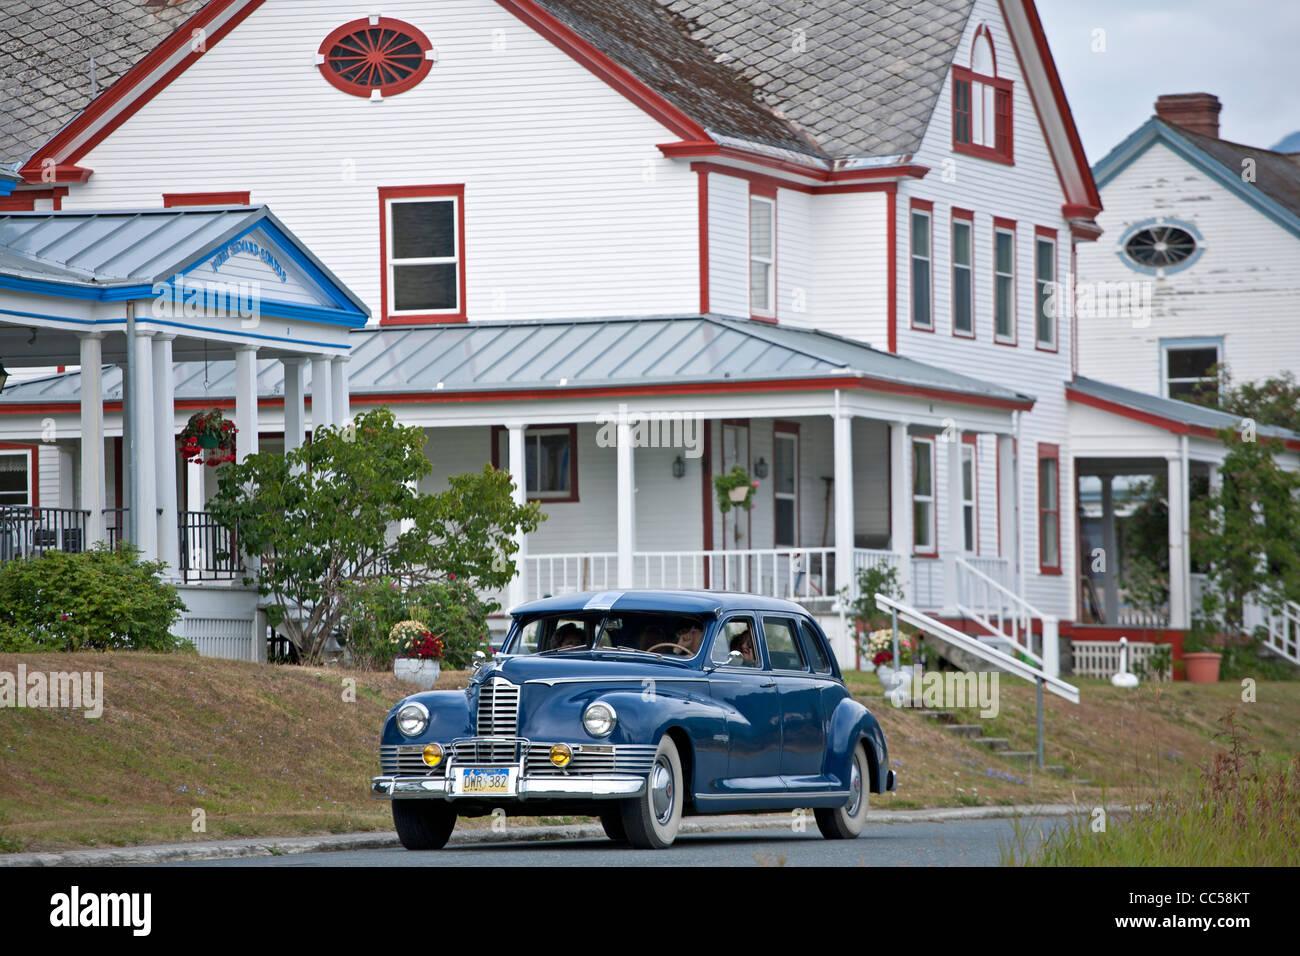 1950 Packard De Luxe 8 Sedan. Haines. Alaska. USA - Stock Image